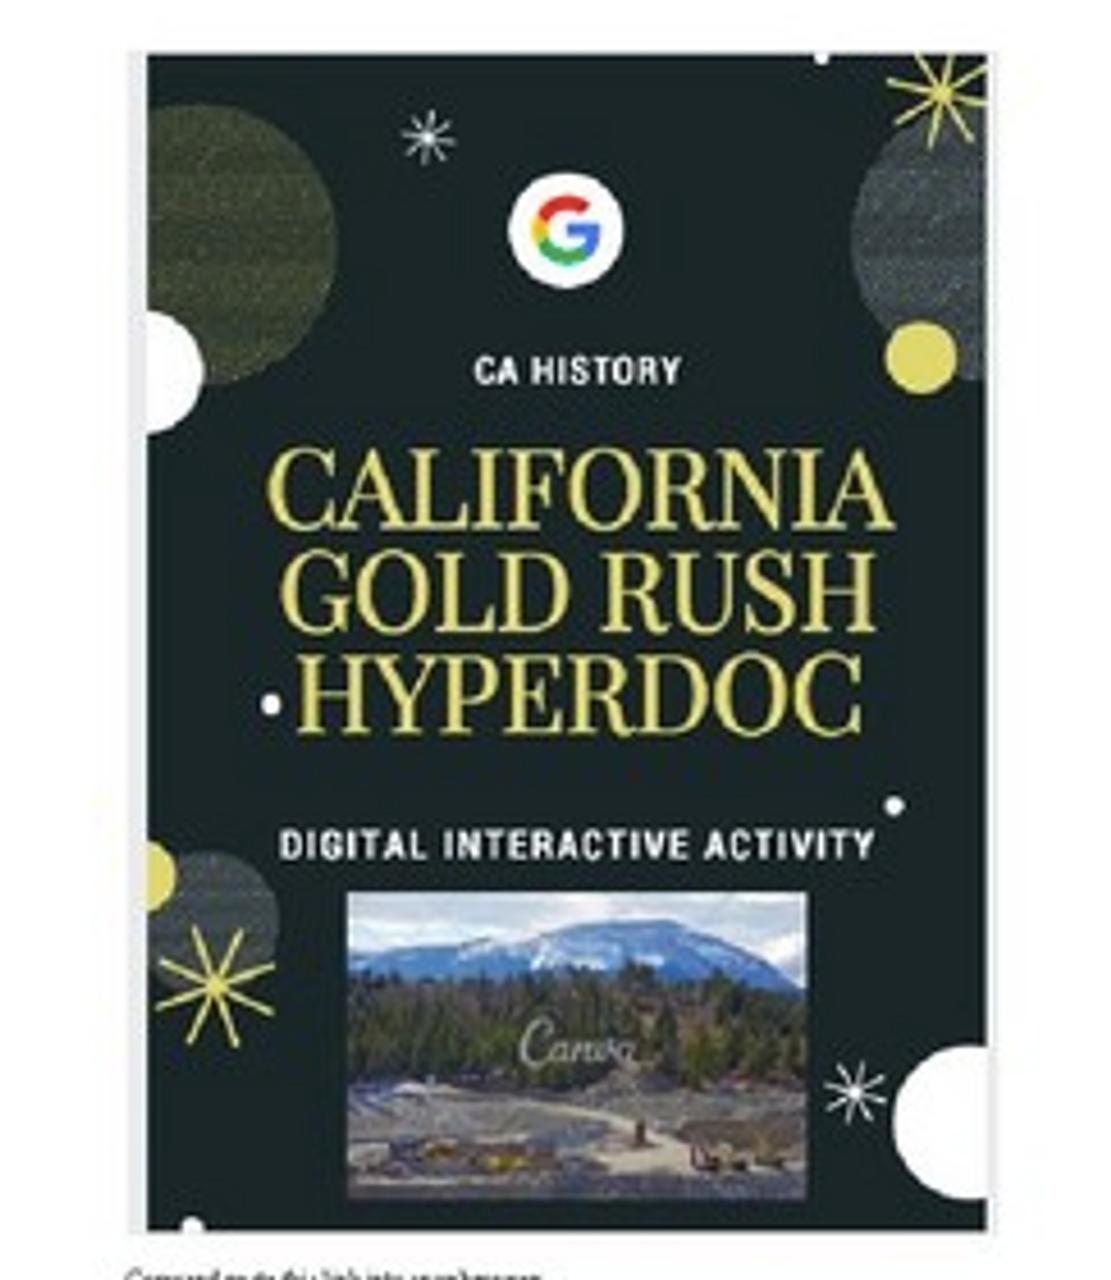 California Gold Rush Hyperdoc